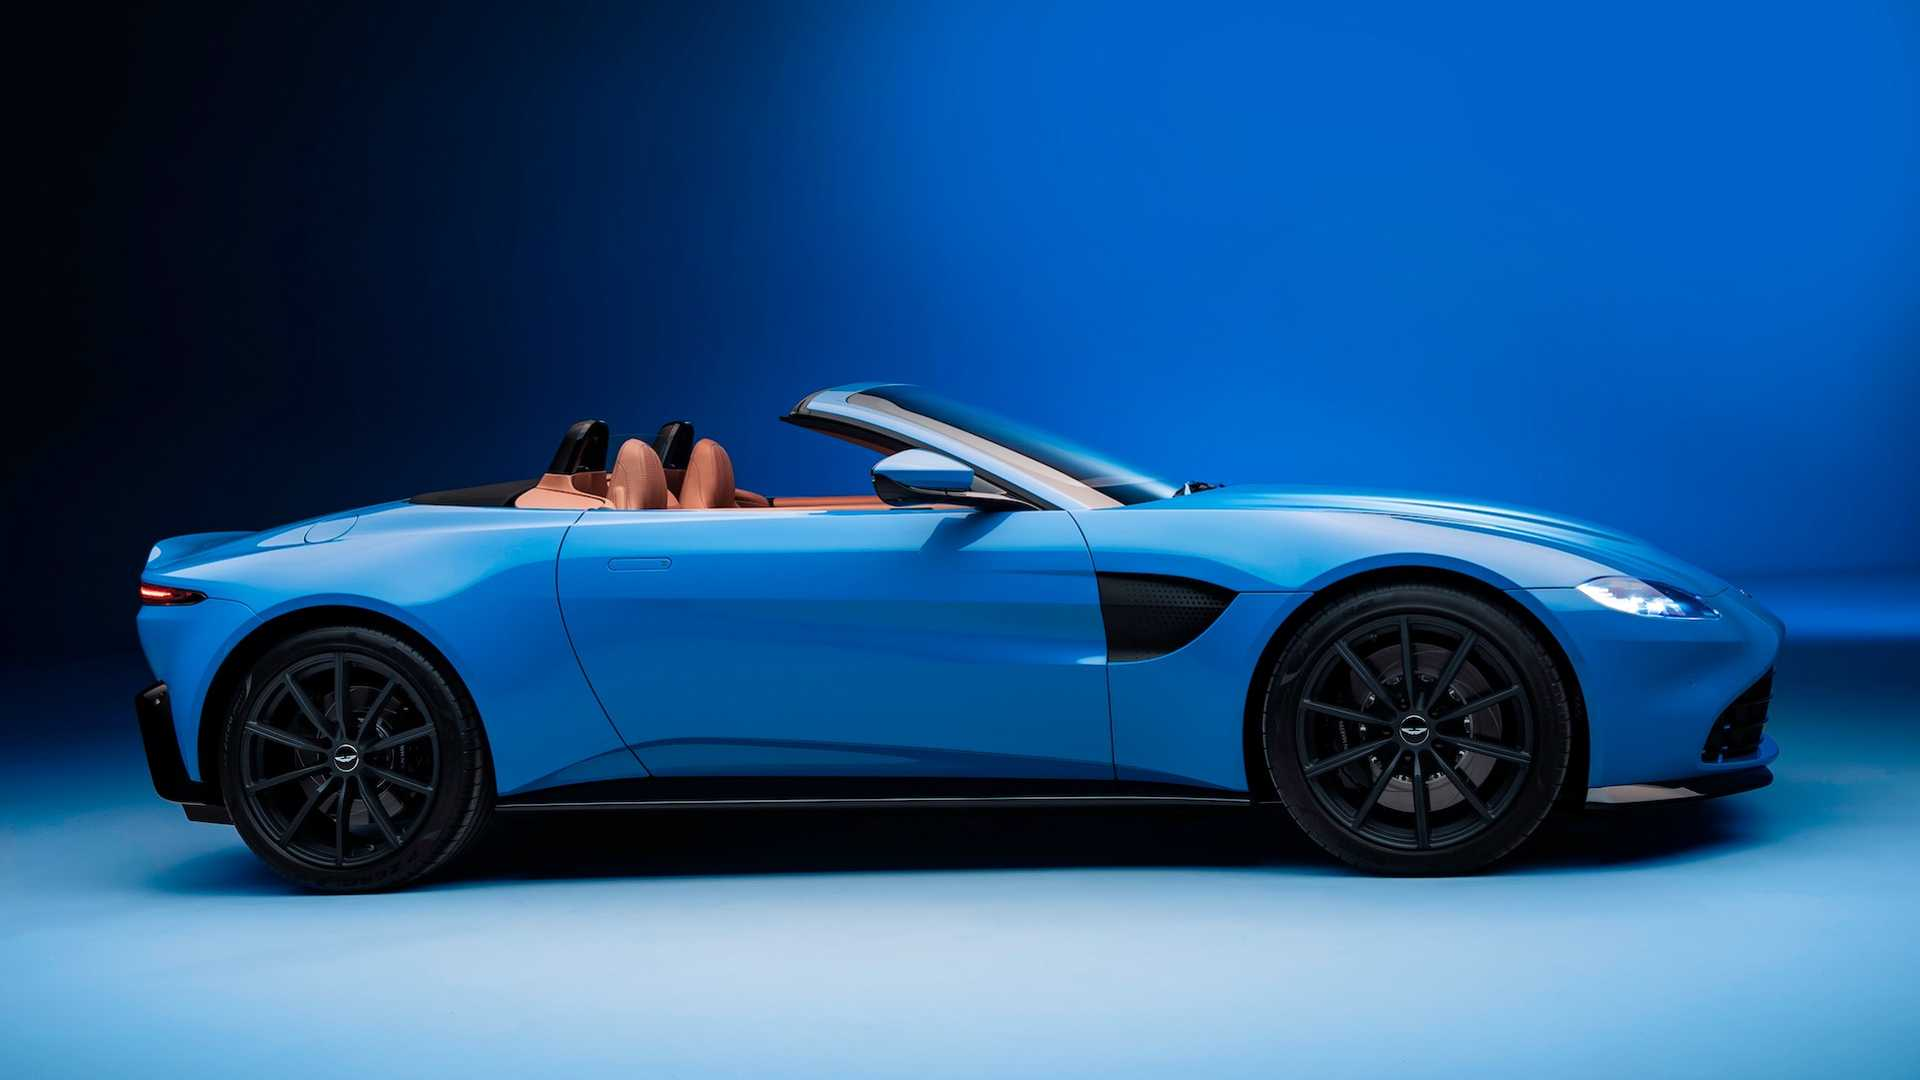 2021-aston-martin-vantage-roadster-1